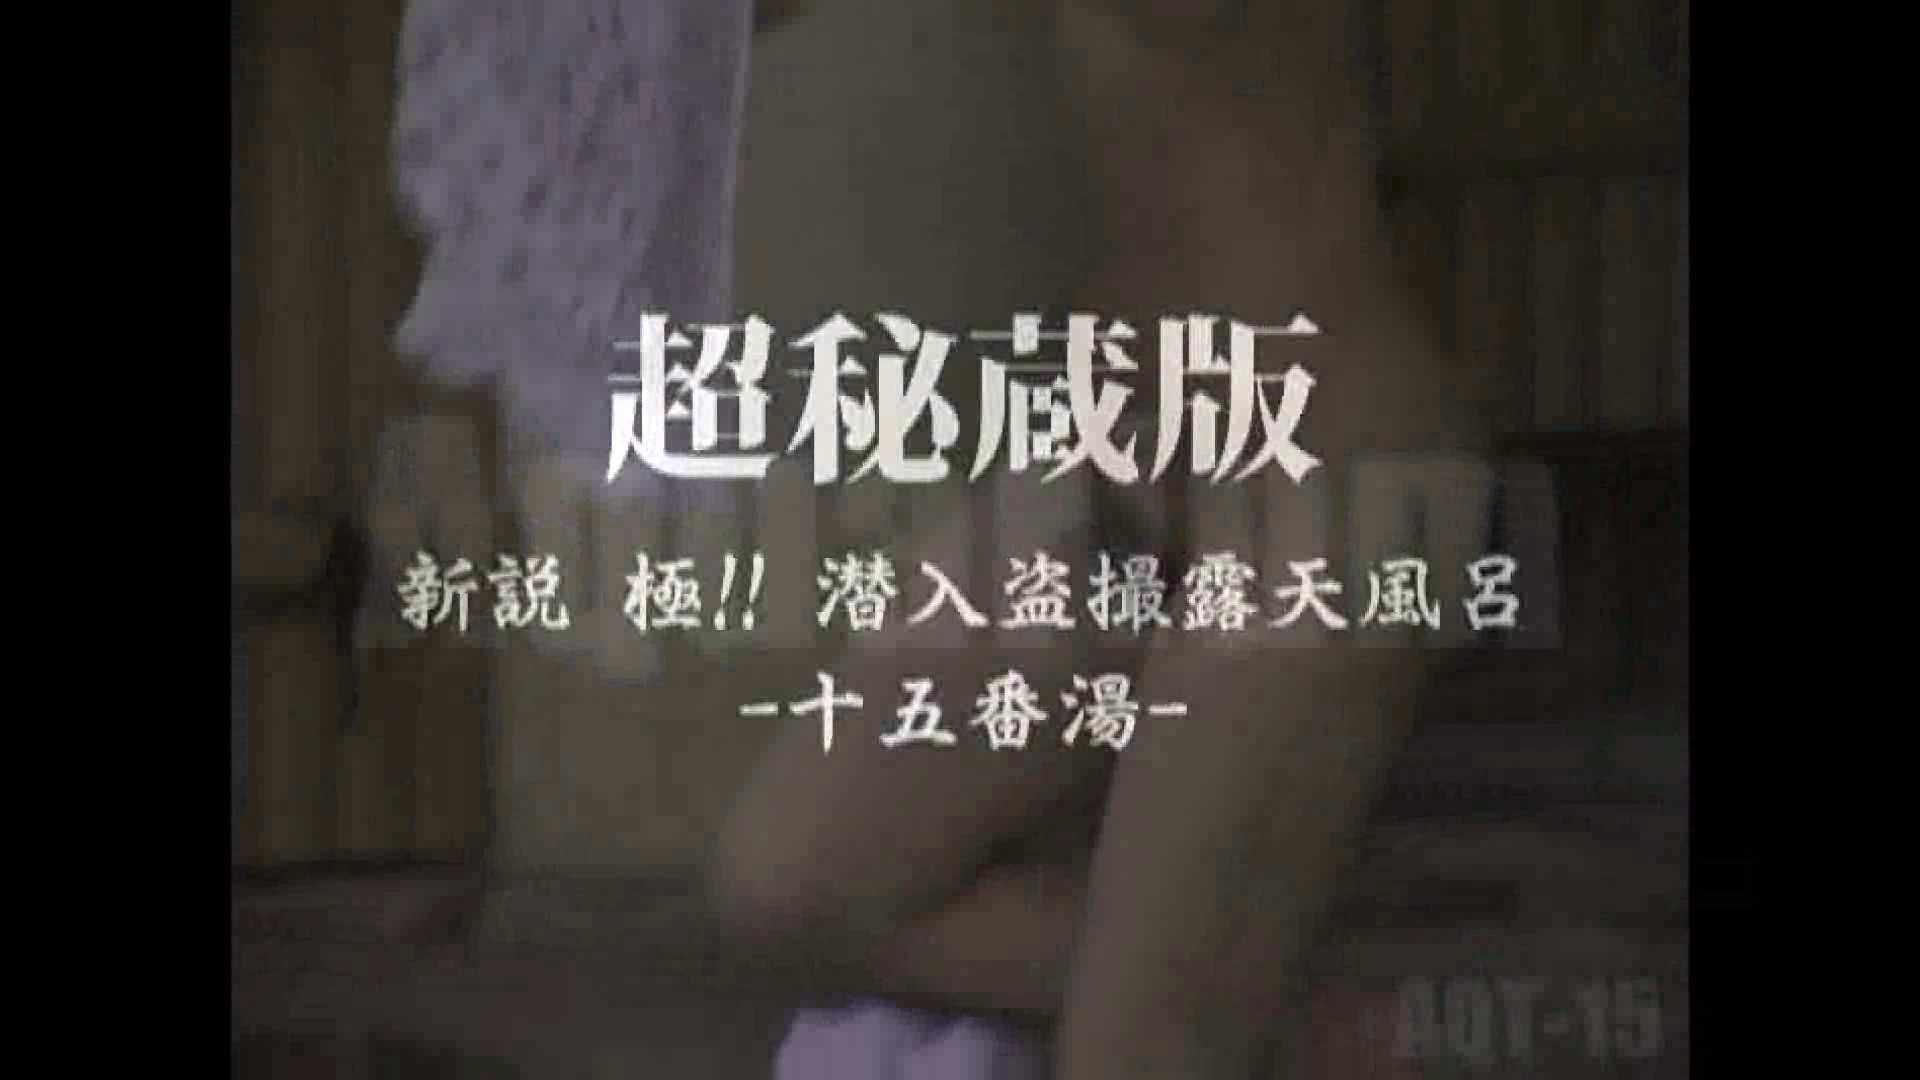 Aquaな露天風呂Vol.878潜入盗撮露天風呂十五判湯 其の二 潜入 | 盗撮  84連発 1